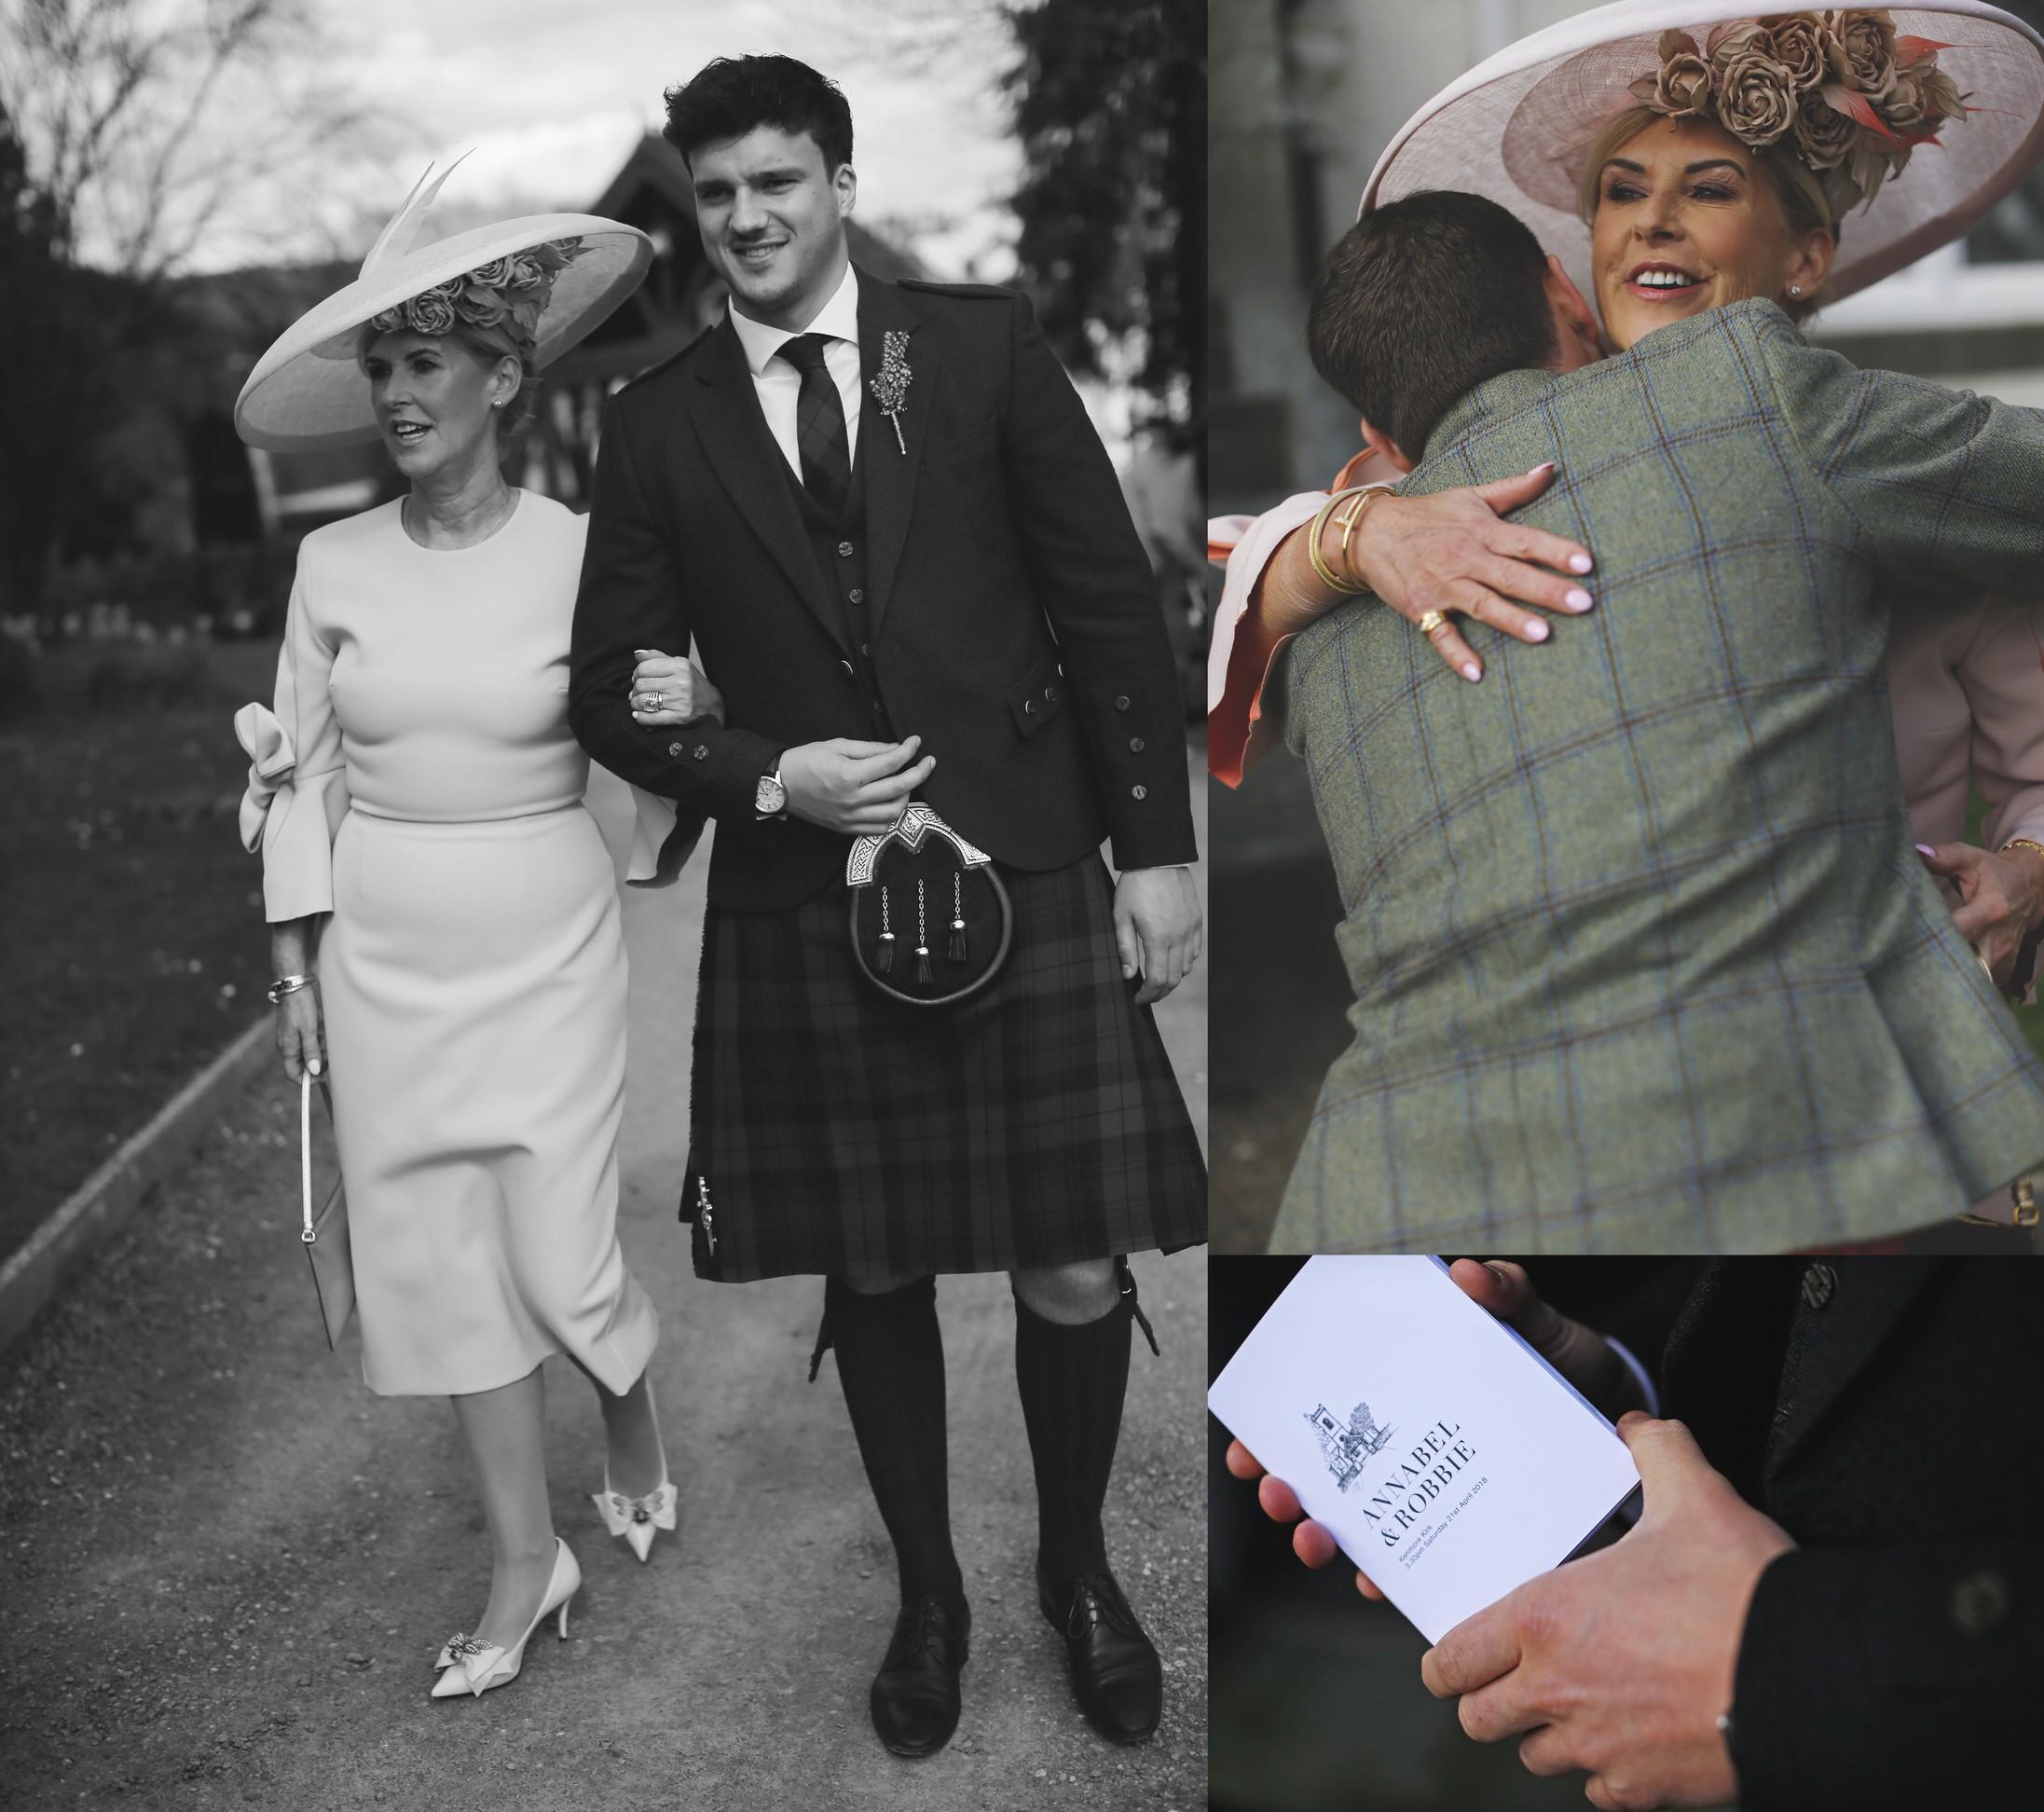 brett-harkness-cotland-wedding-photographer-highland-wedding_0013.jpg